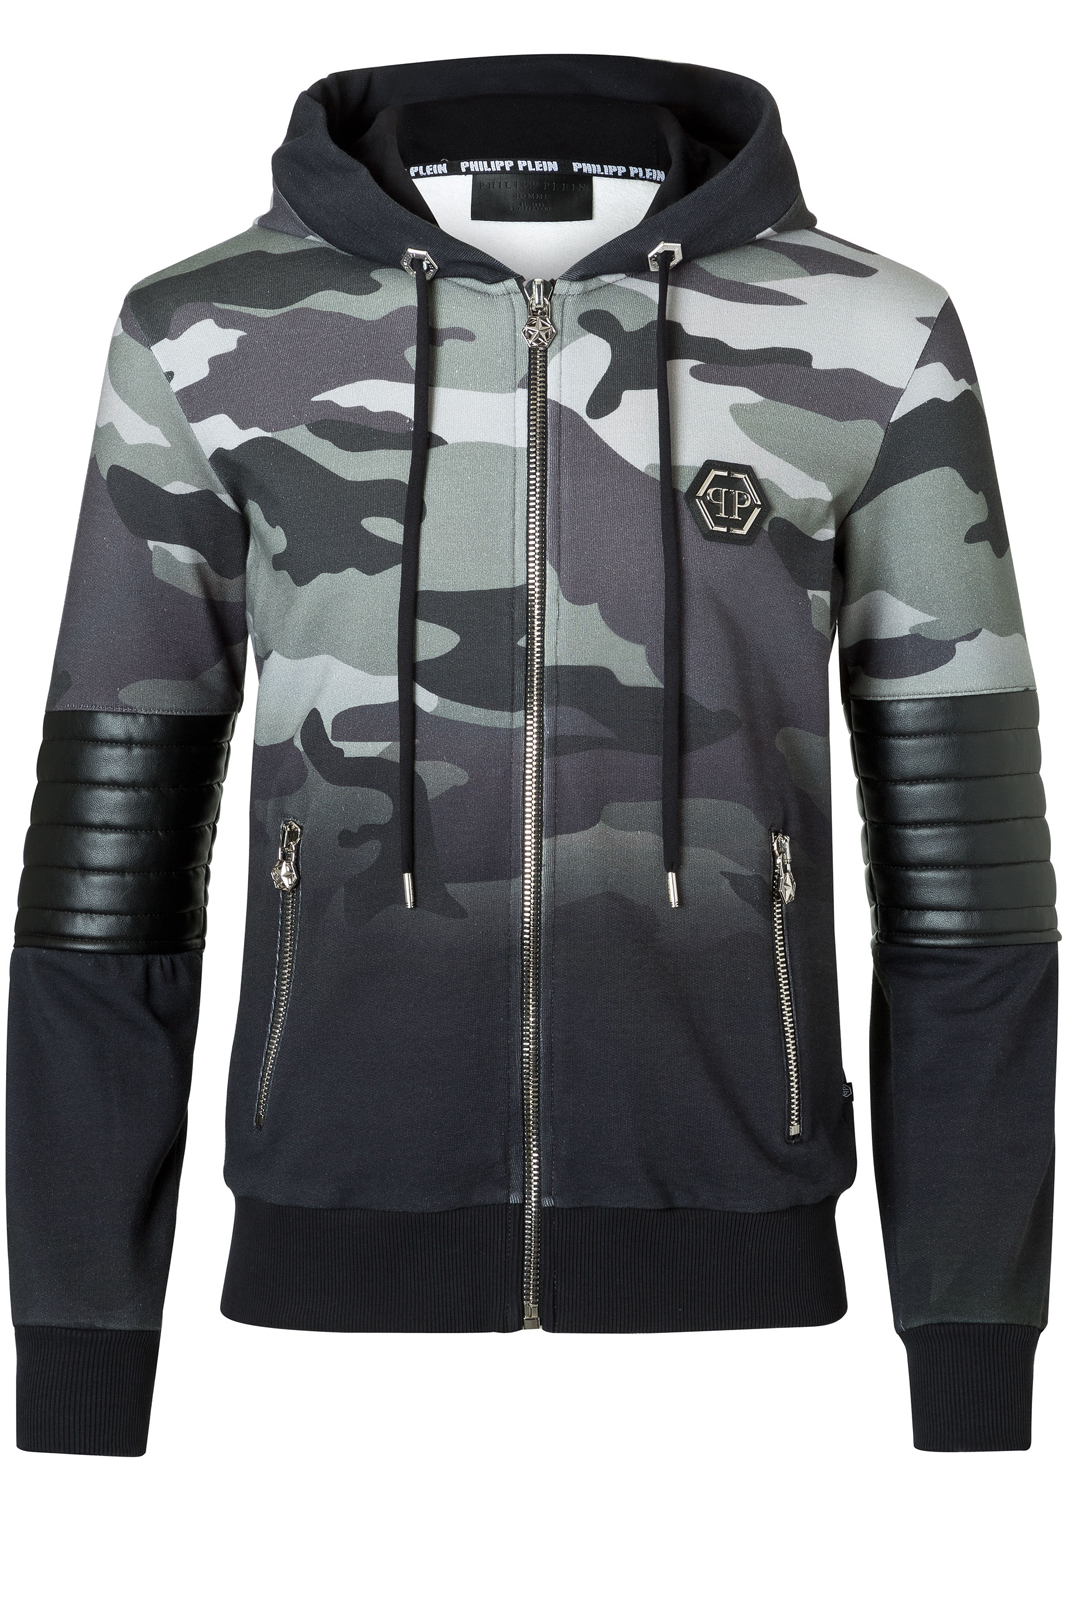 Vestes zippées  Philipp plein F17C MJB0110 RAIDEN CM99 CAMOU BLACK